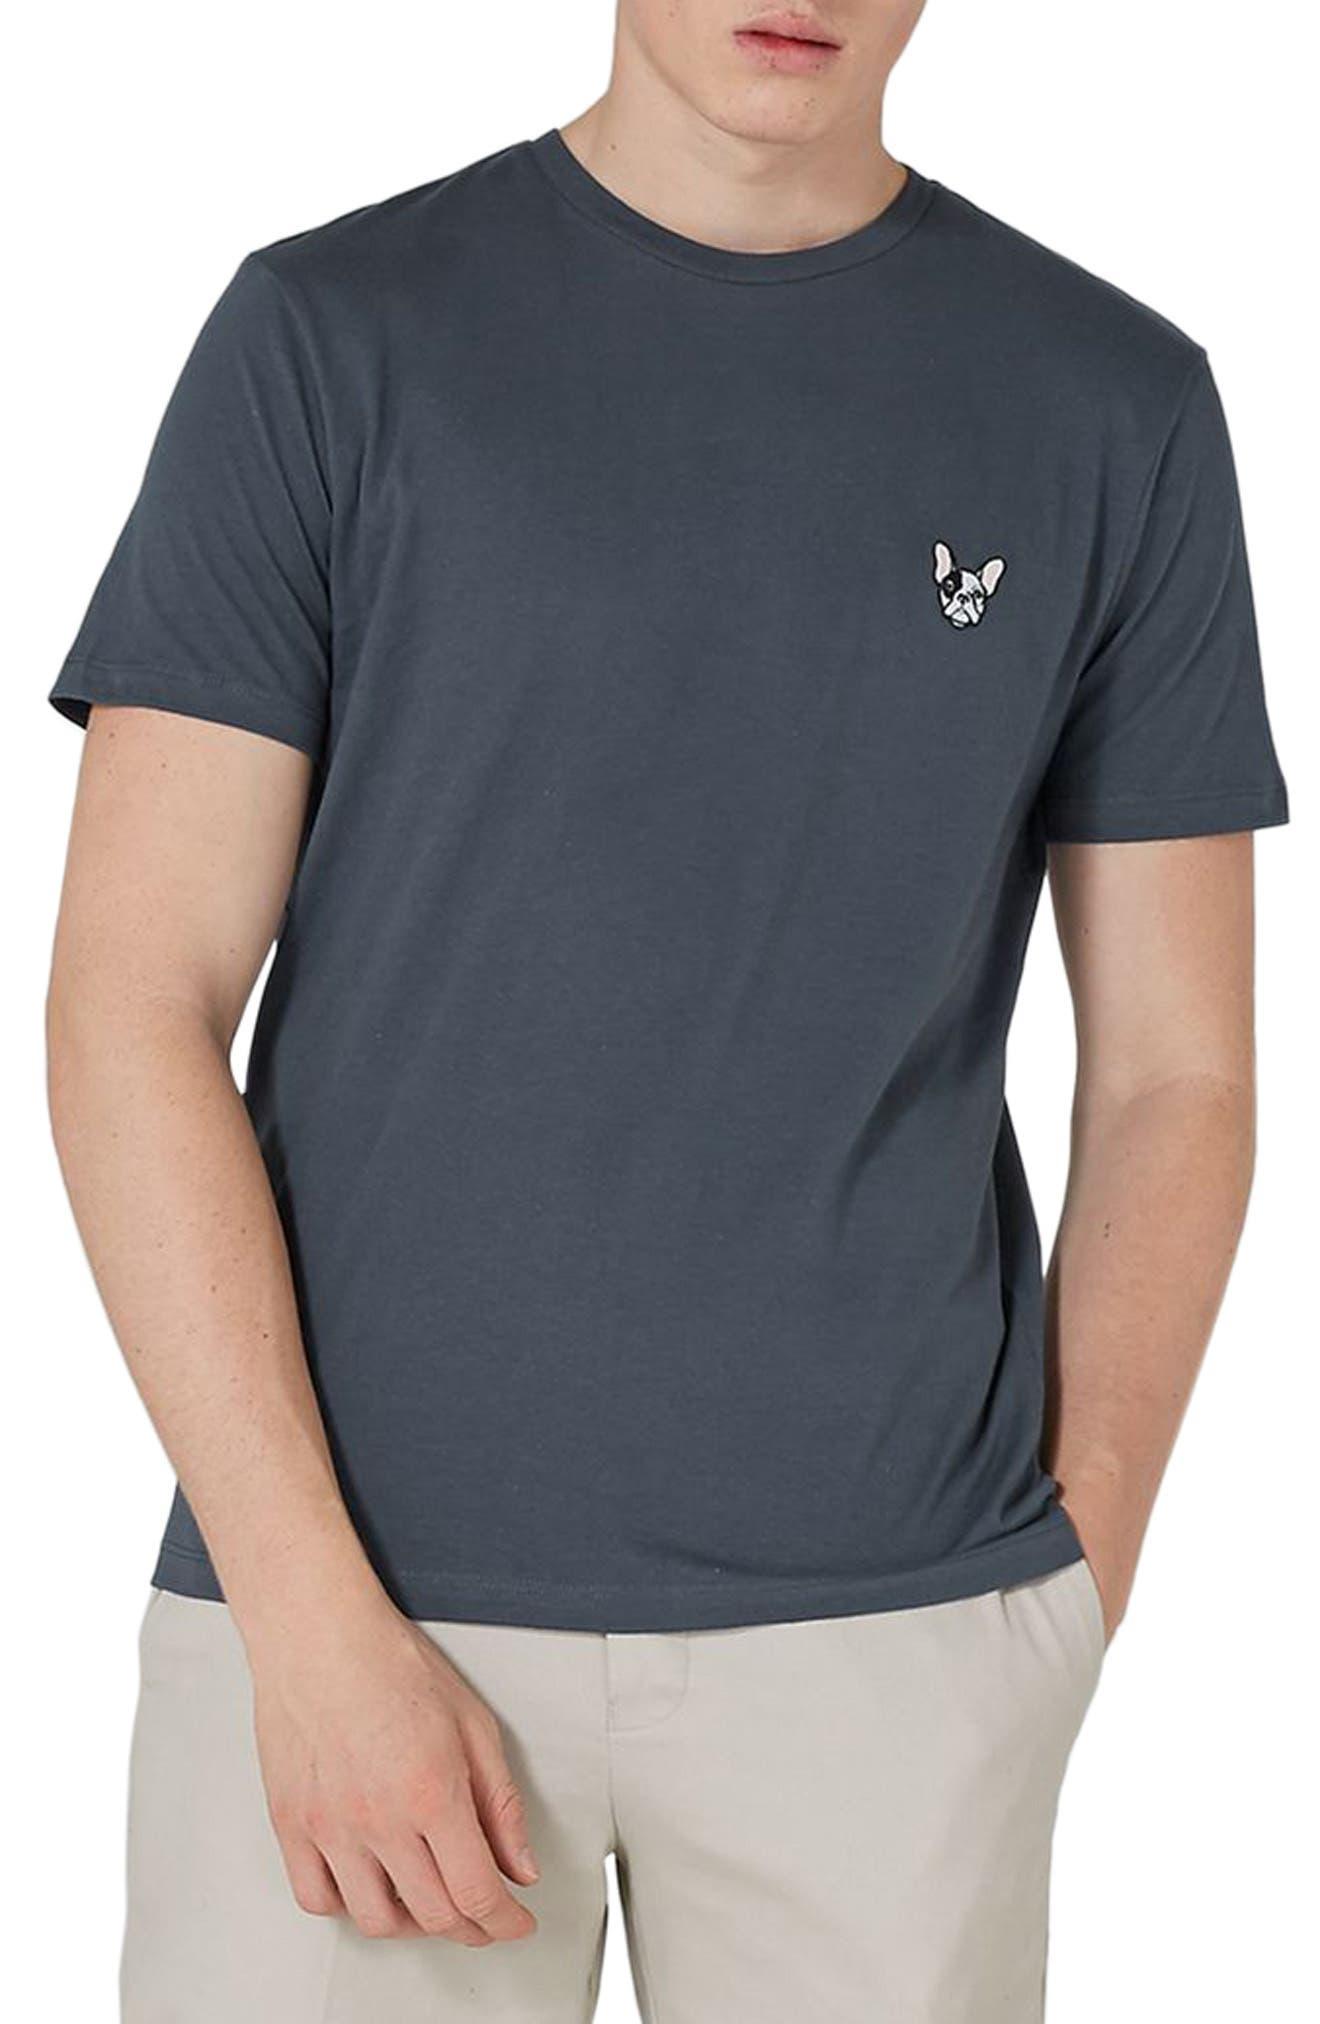 Topman Frenchie Patch T-Shirt